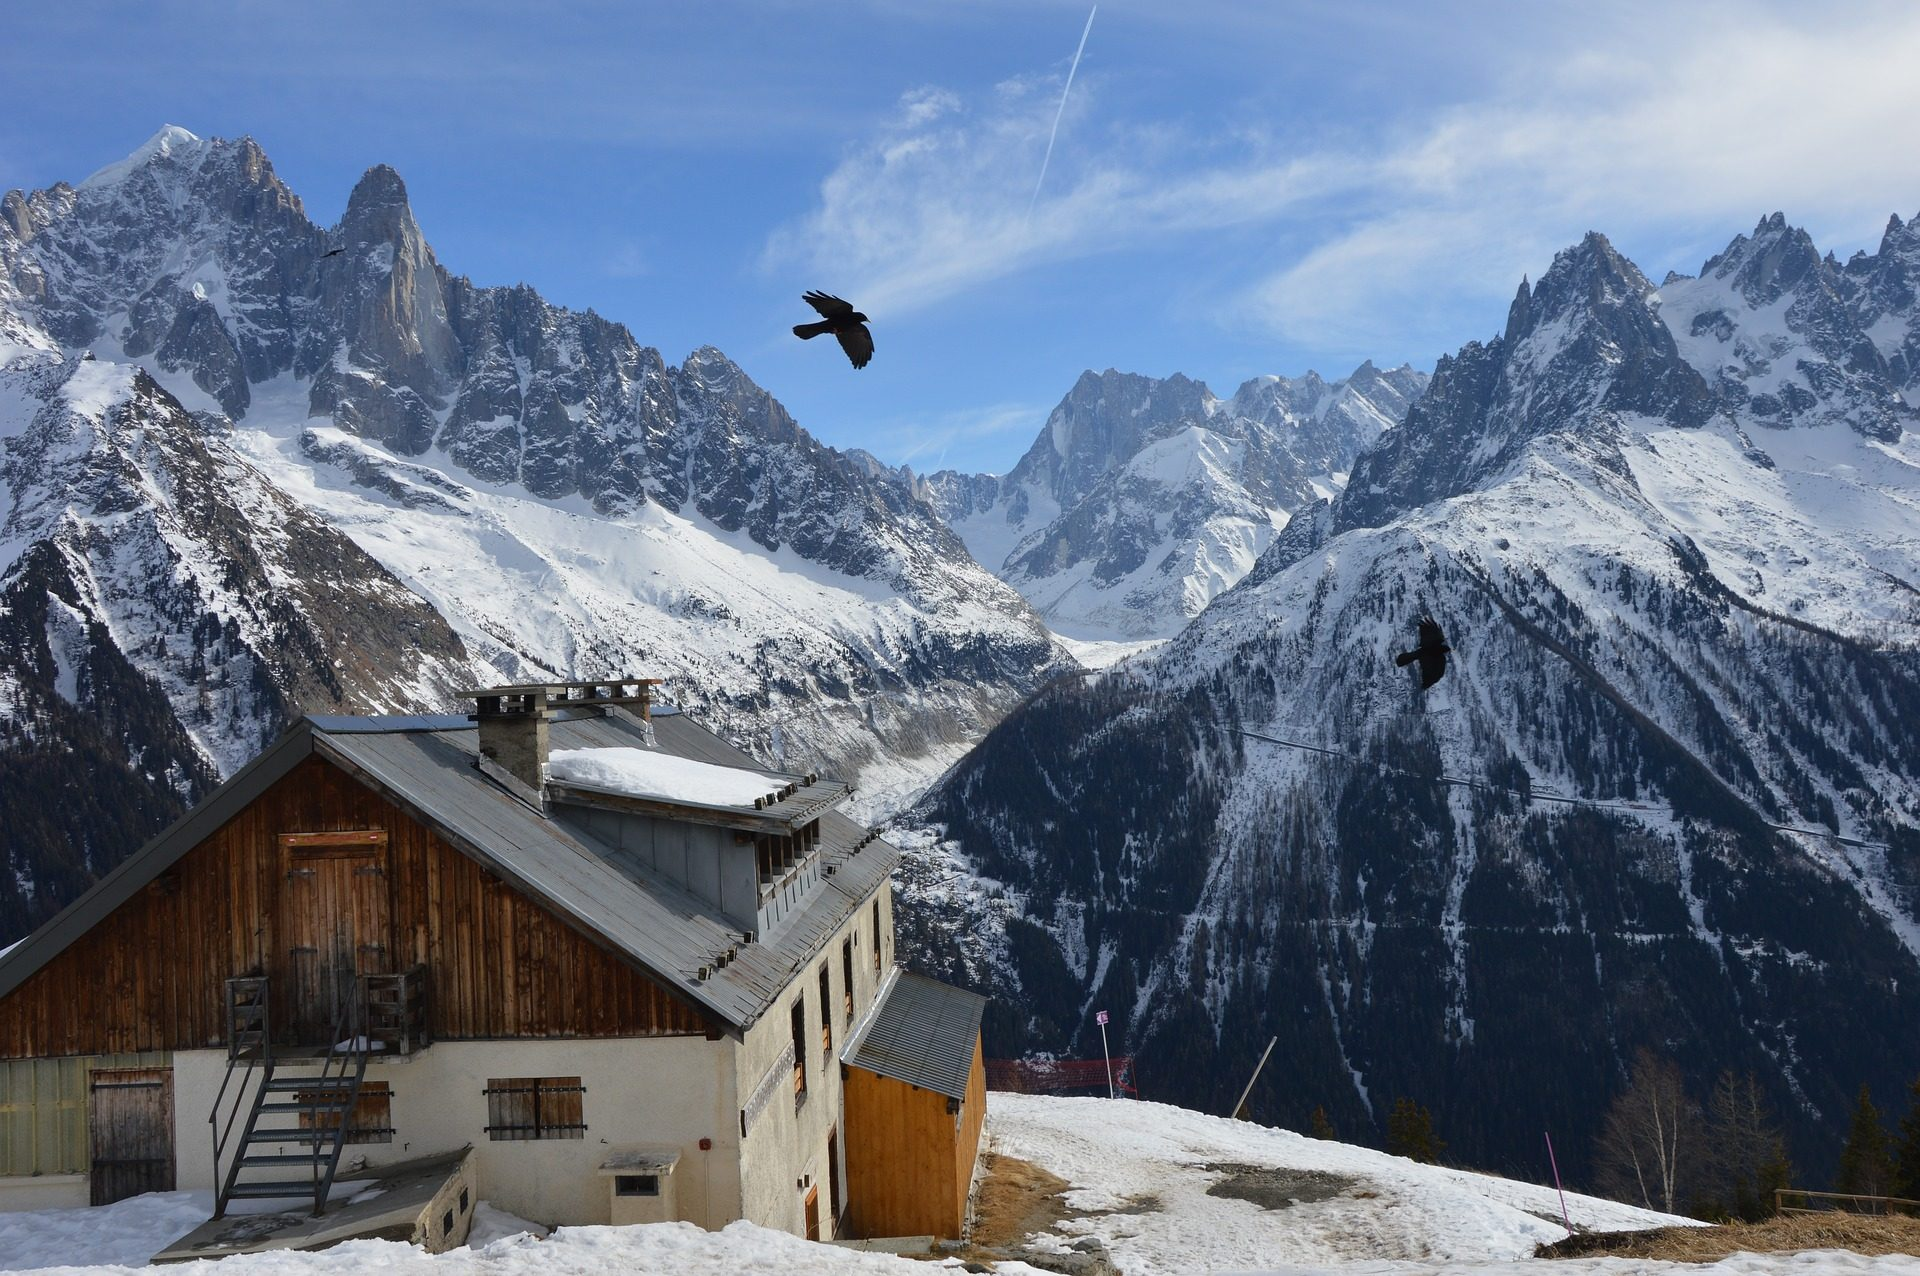 Montañas, Πίτσα, χιόνι, Σπίτι, Λ., ύψη - Wallpapers HD - Professor-falken.com